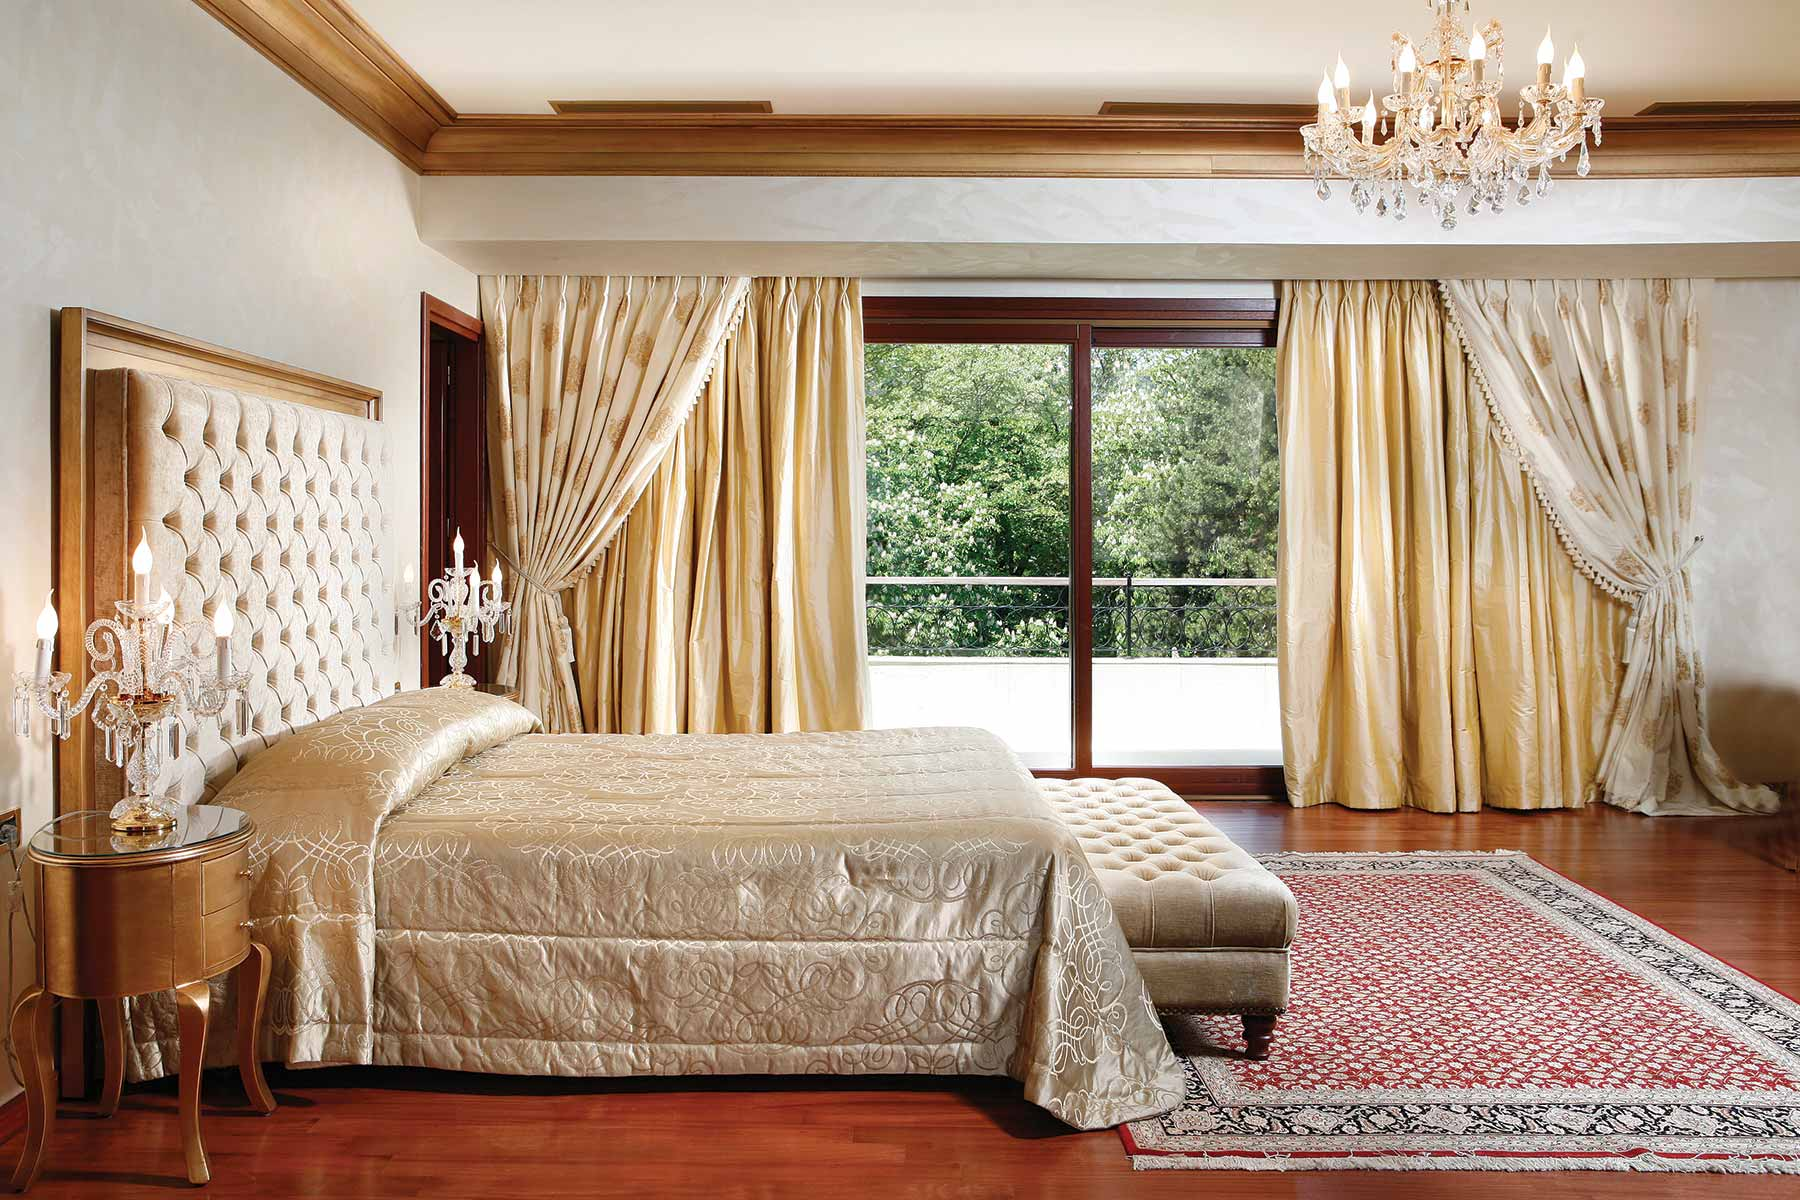 7_presidential-suite-grand-serai-ioannina-1.jpg